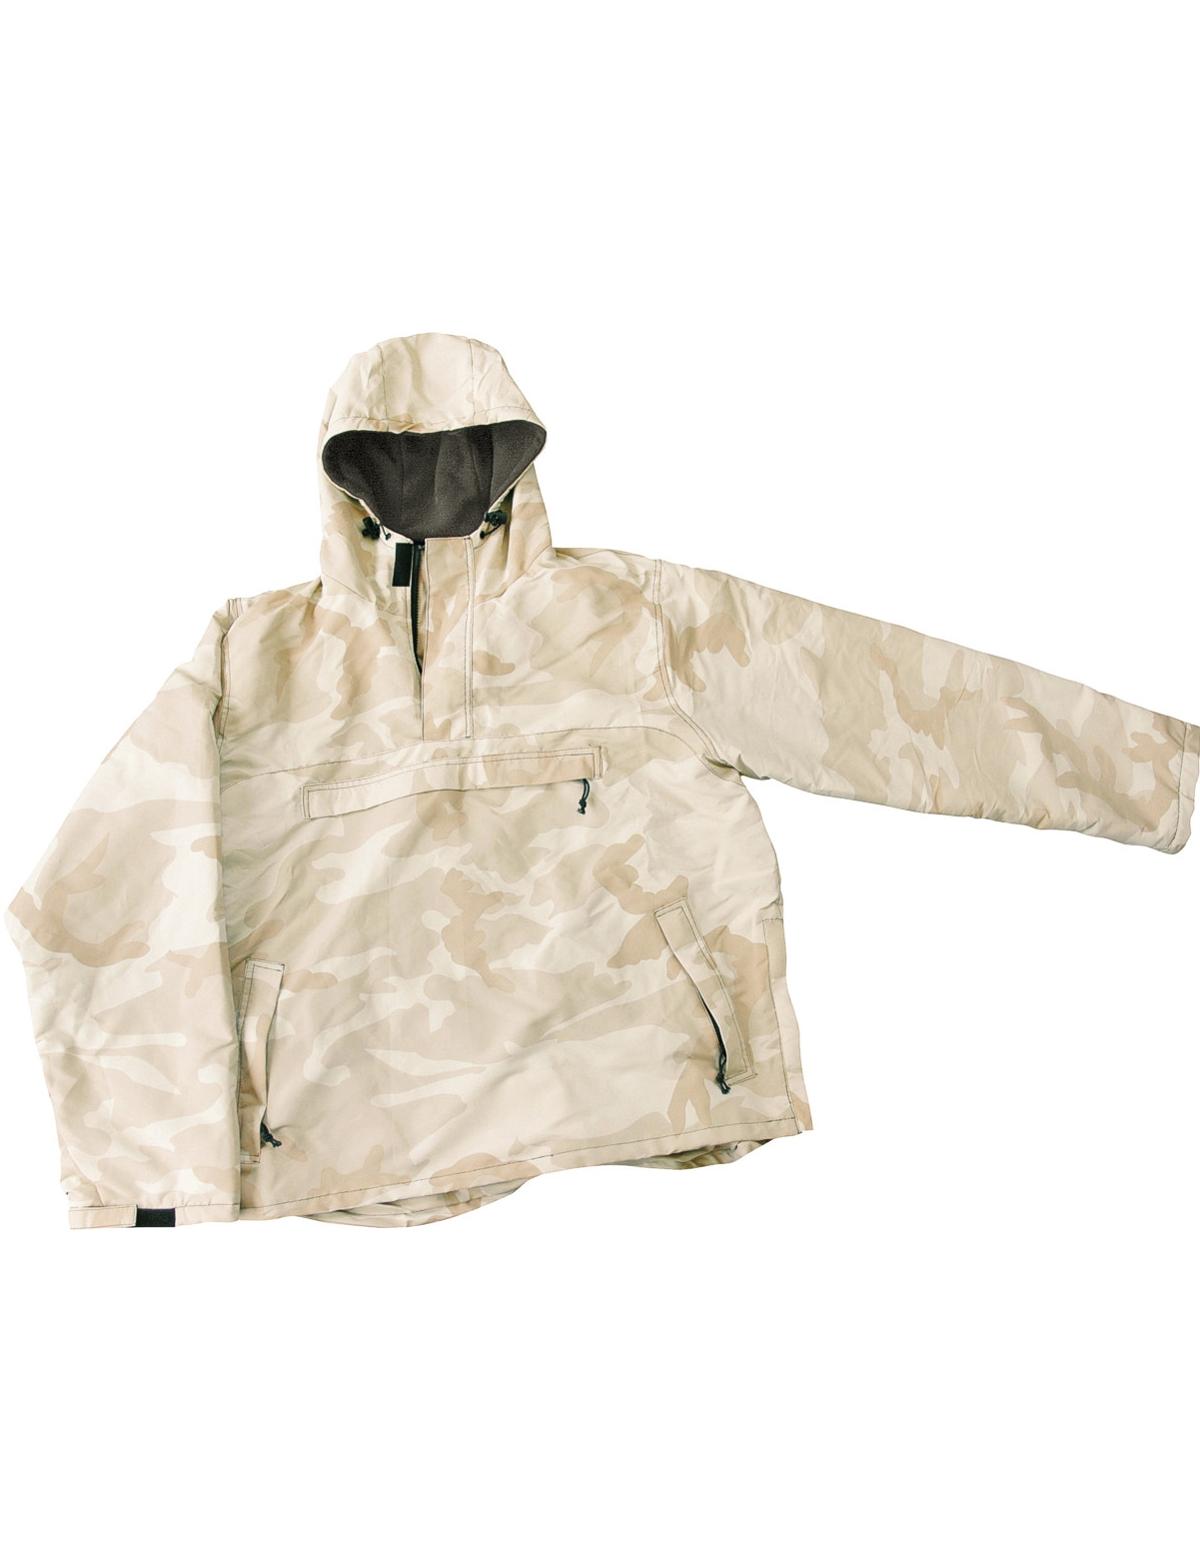 Windjacke Schlupfjacke Stormfighter Jacket Sand Camo